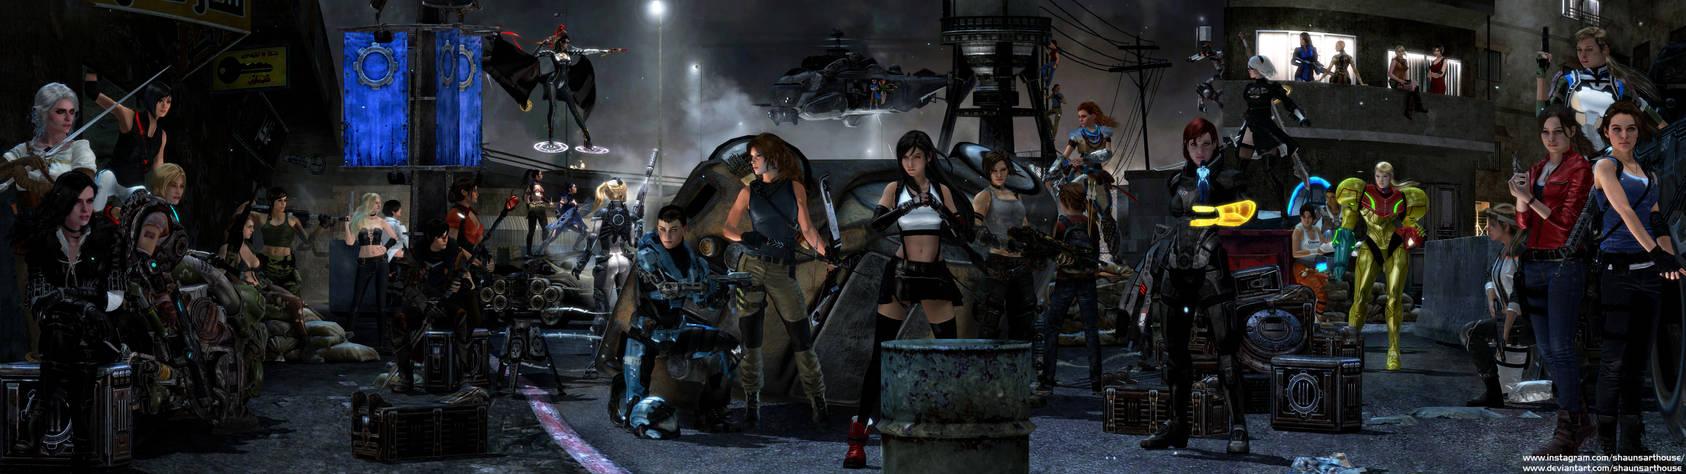 Gaming's toughest girls - Dual Screen Wallpaper